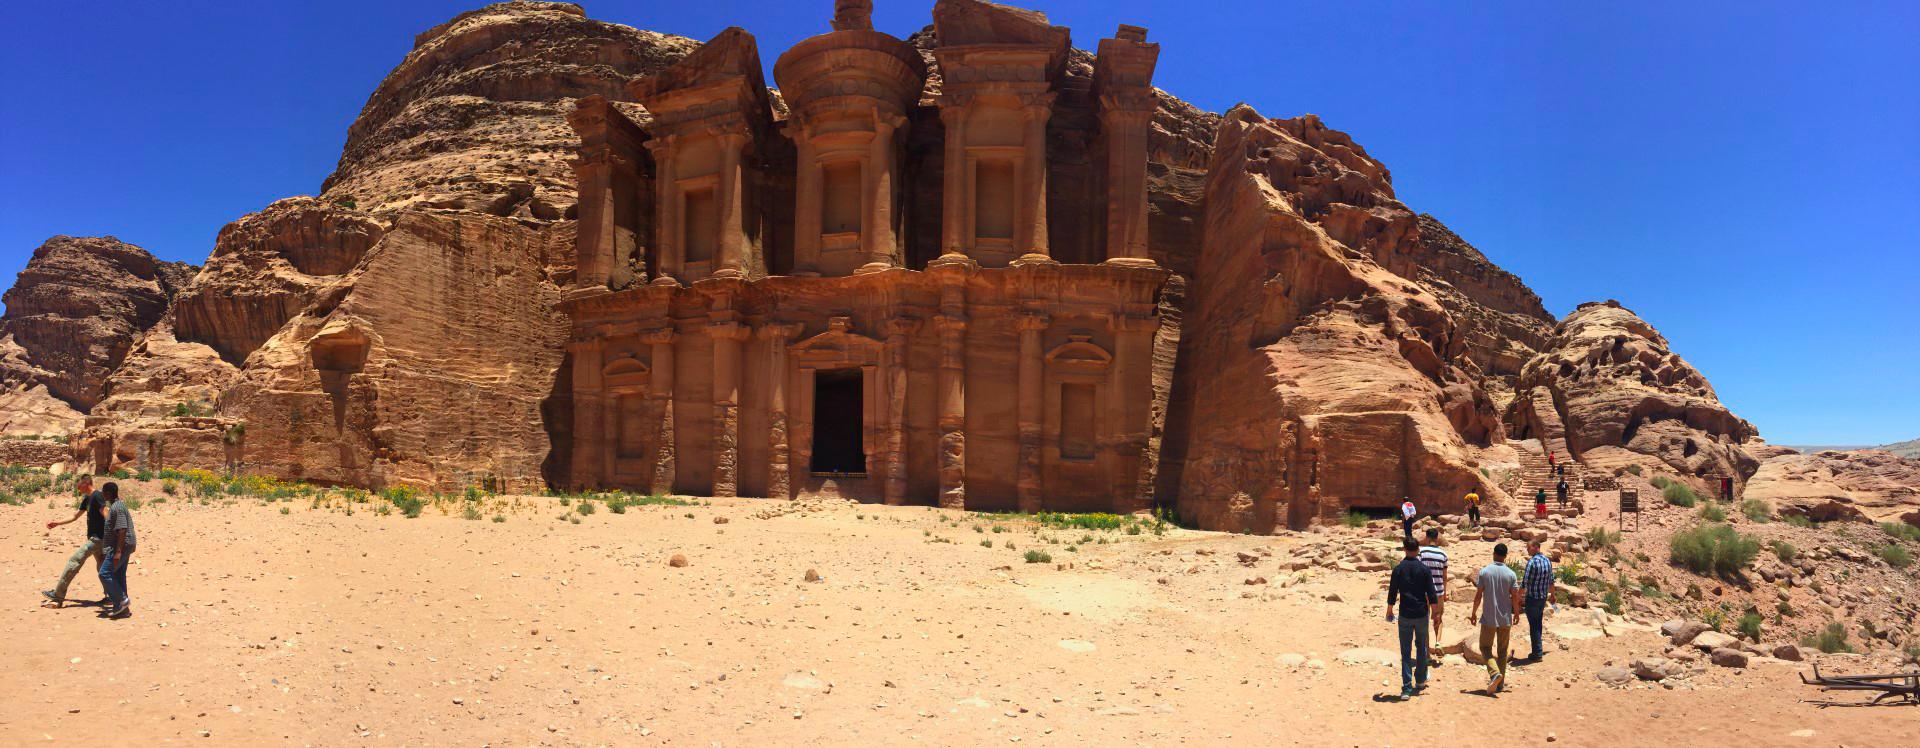 Monasterio de Petra, Jordania petra, jordania - 28271145412 290dd45fe9 o - Petra, Jordania